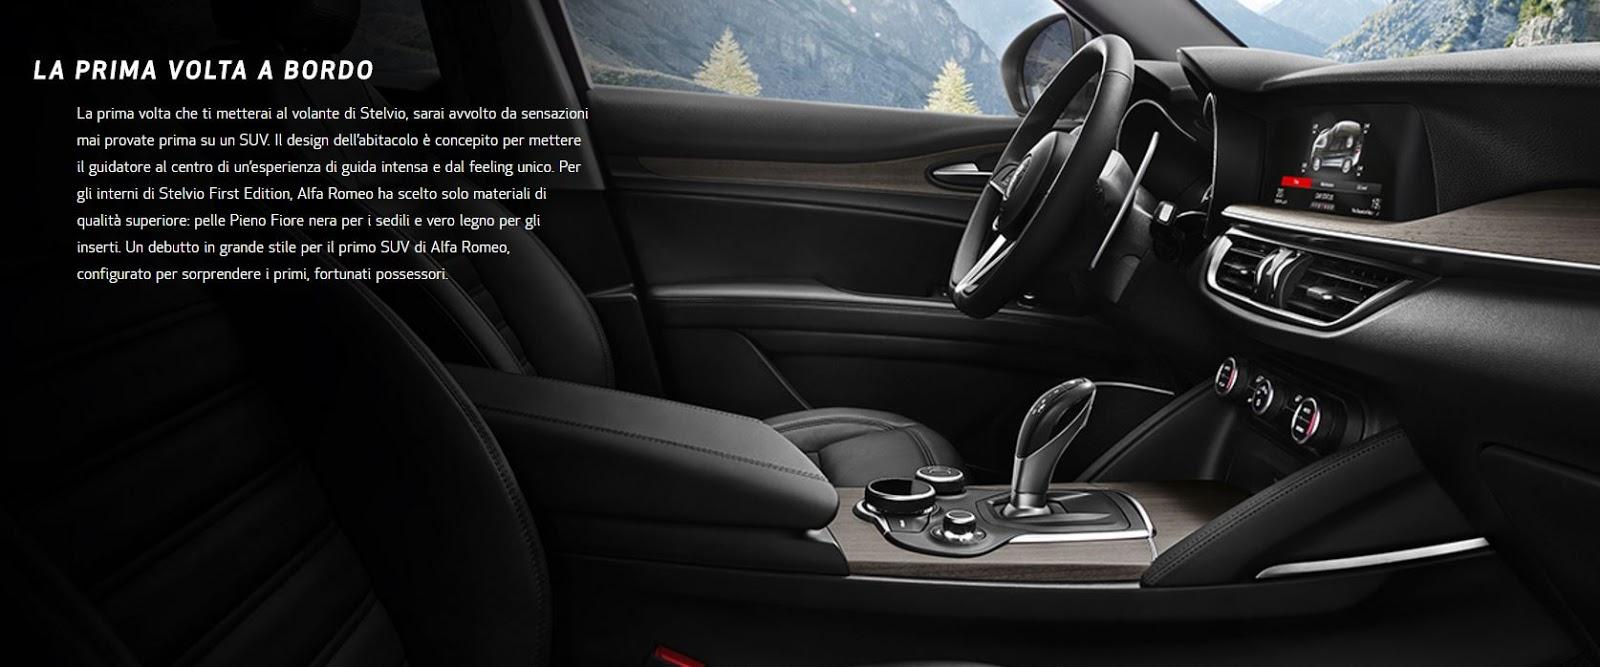 Foto Alfa Romeo Stelvio First Edition interni